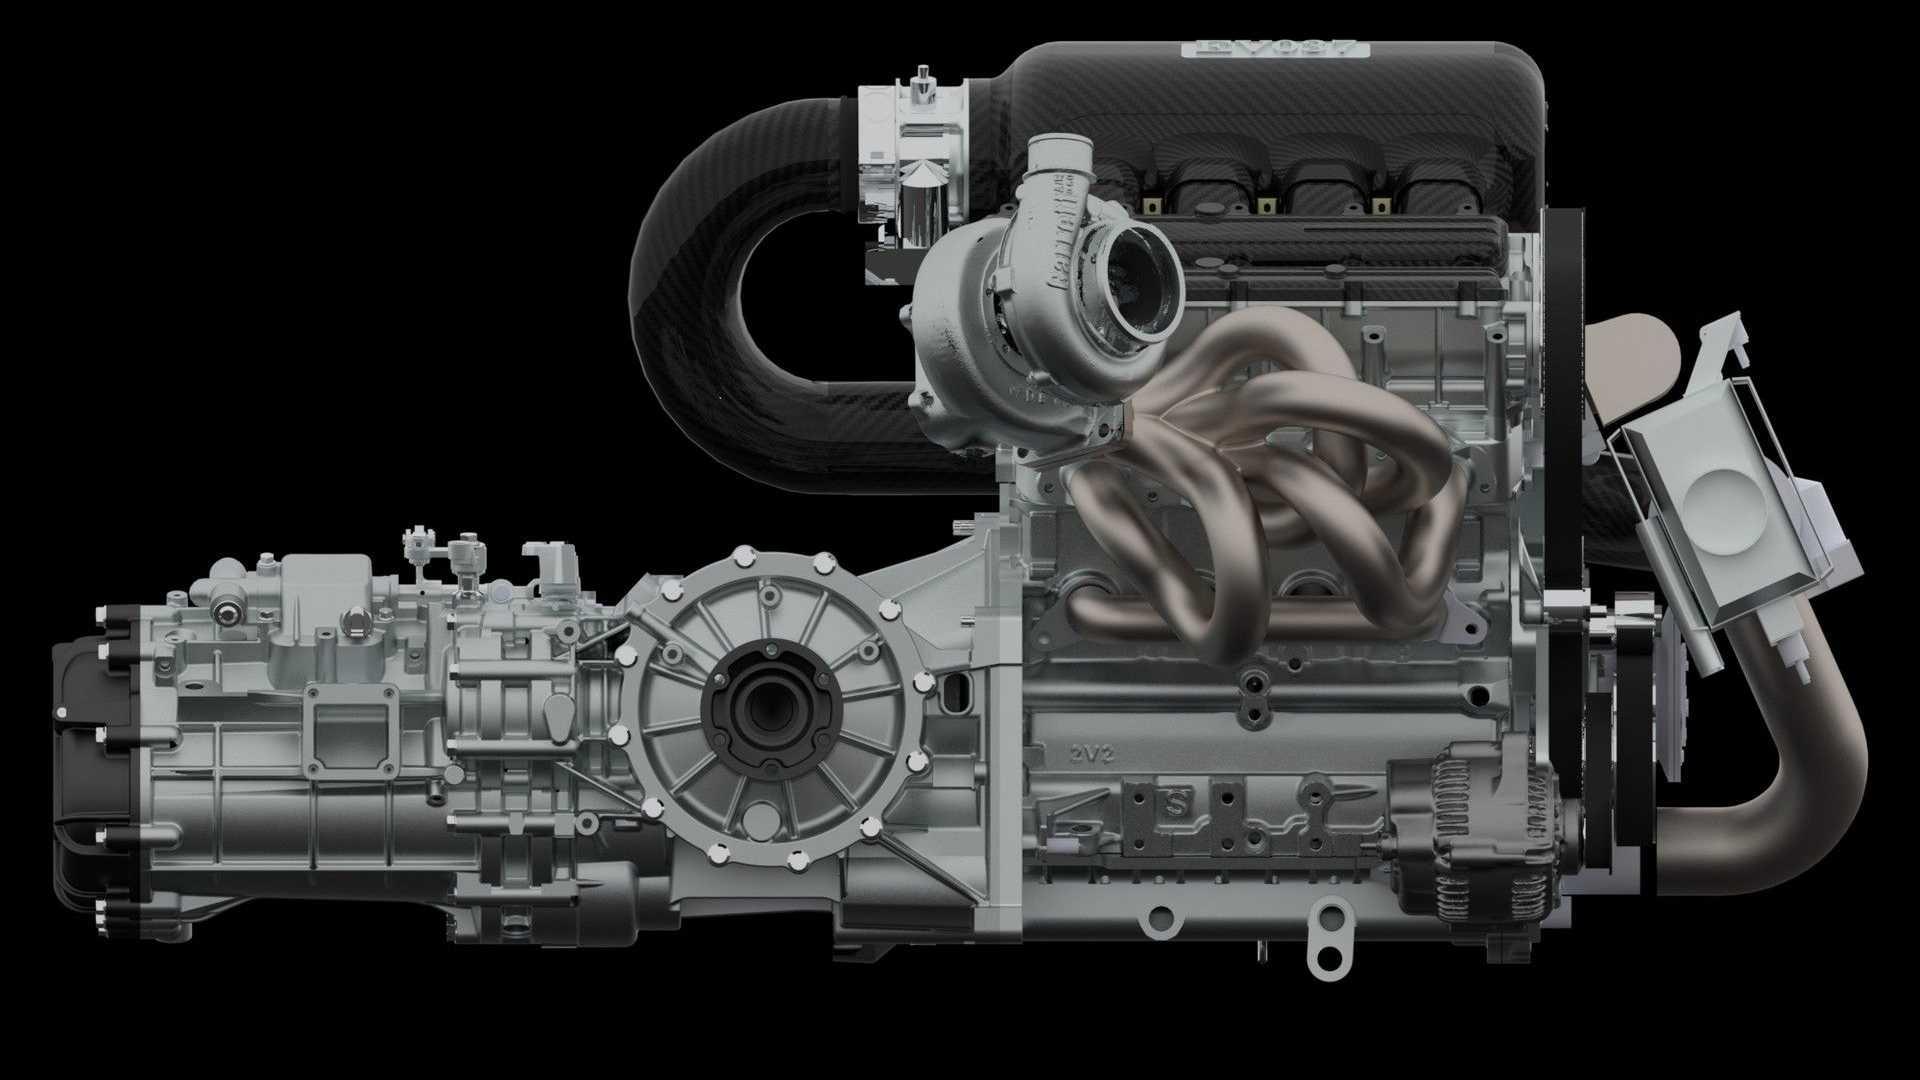 Motoren yter hele 500 hestekrefter!